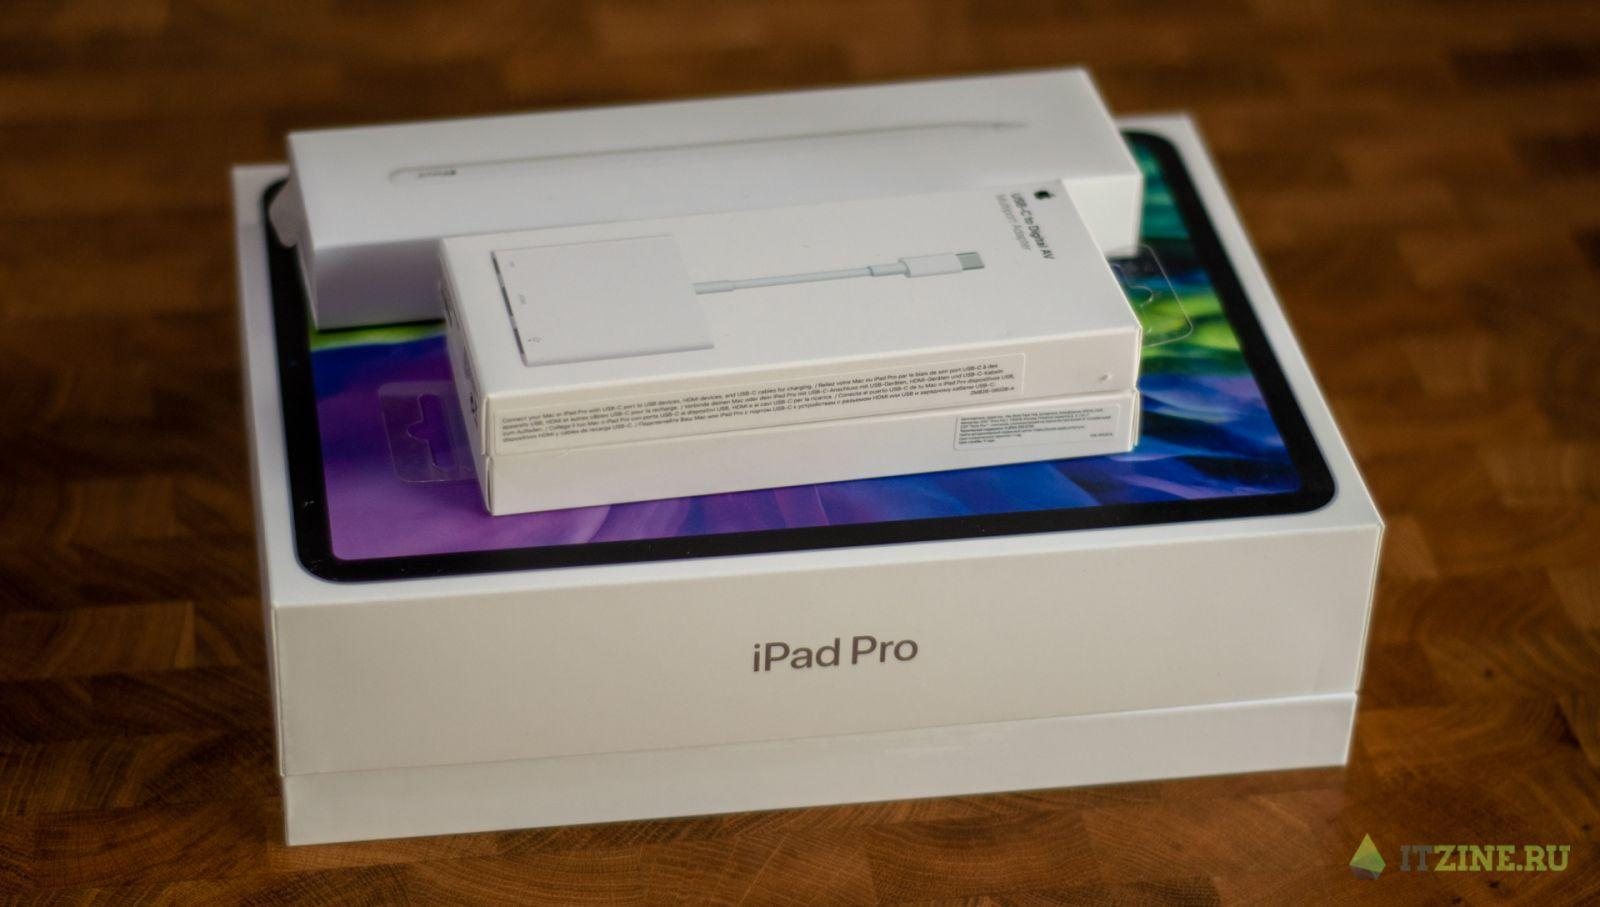 Дизайнерский рай. Обзор Apple iPad Pro 2020 + Apple Pencil + Magic Keyboard (dsc 8812)